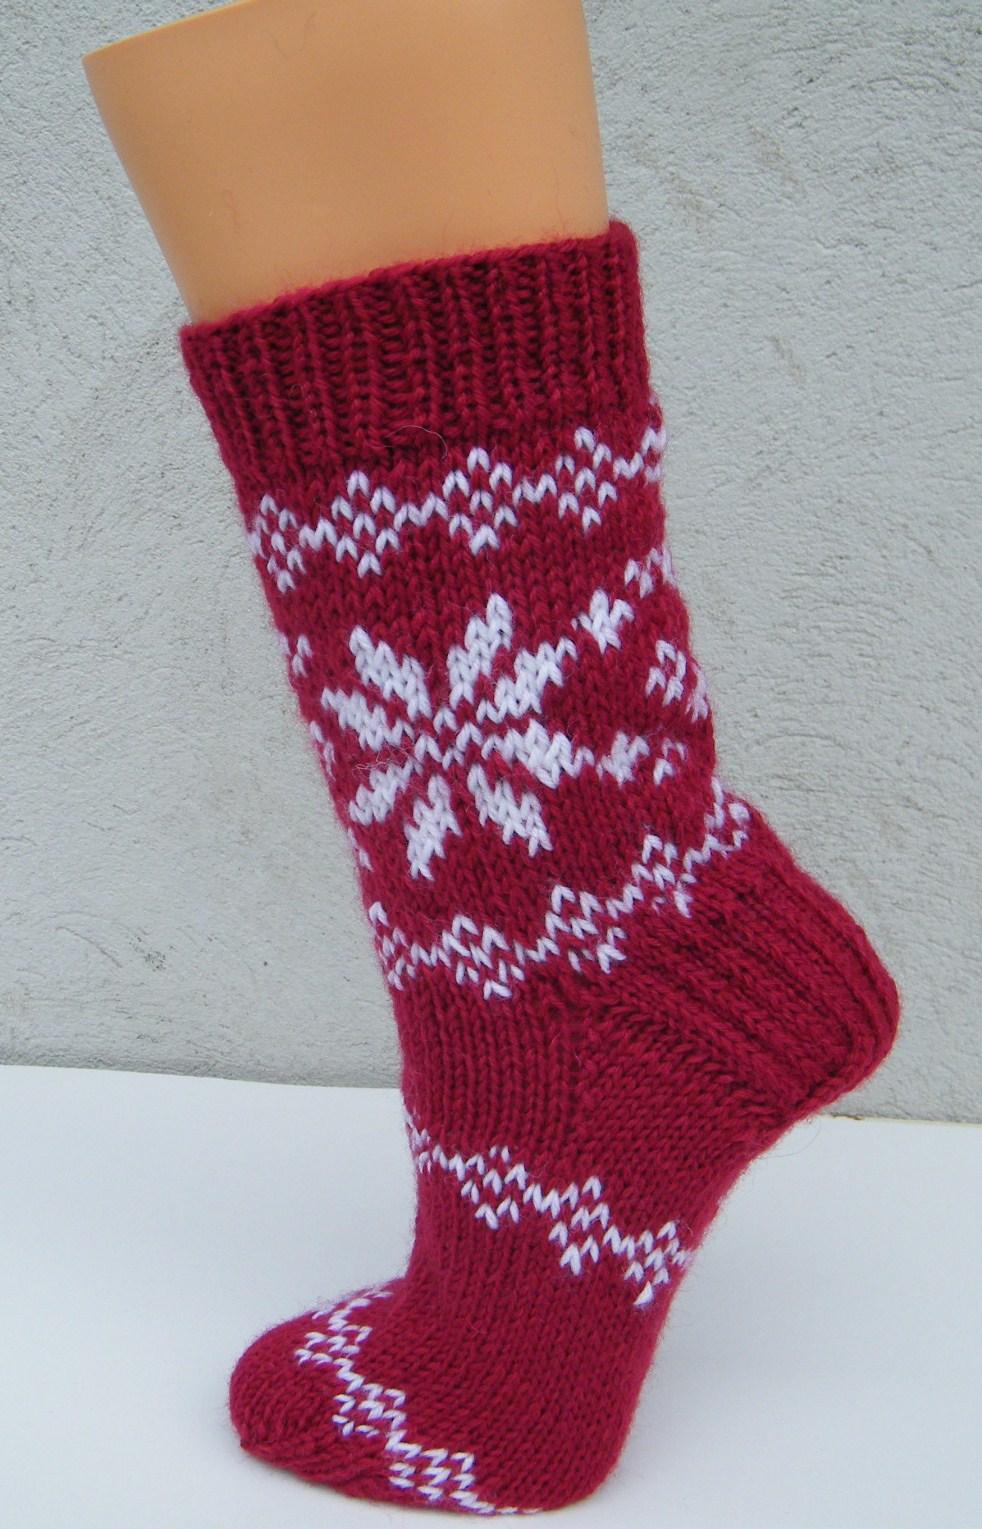 Strickanleitung Socken im Norwegermuster Gr. 20